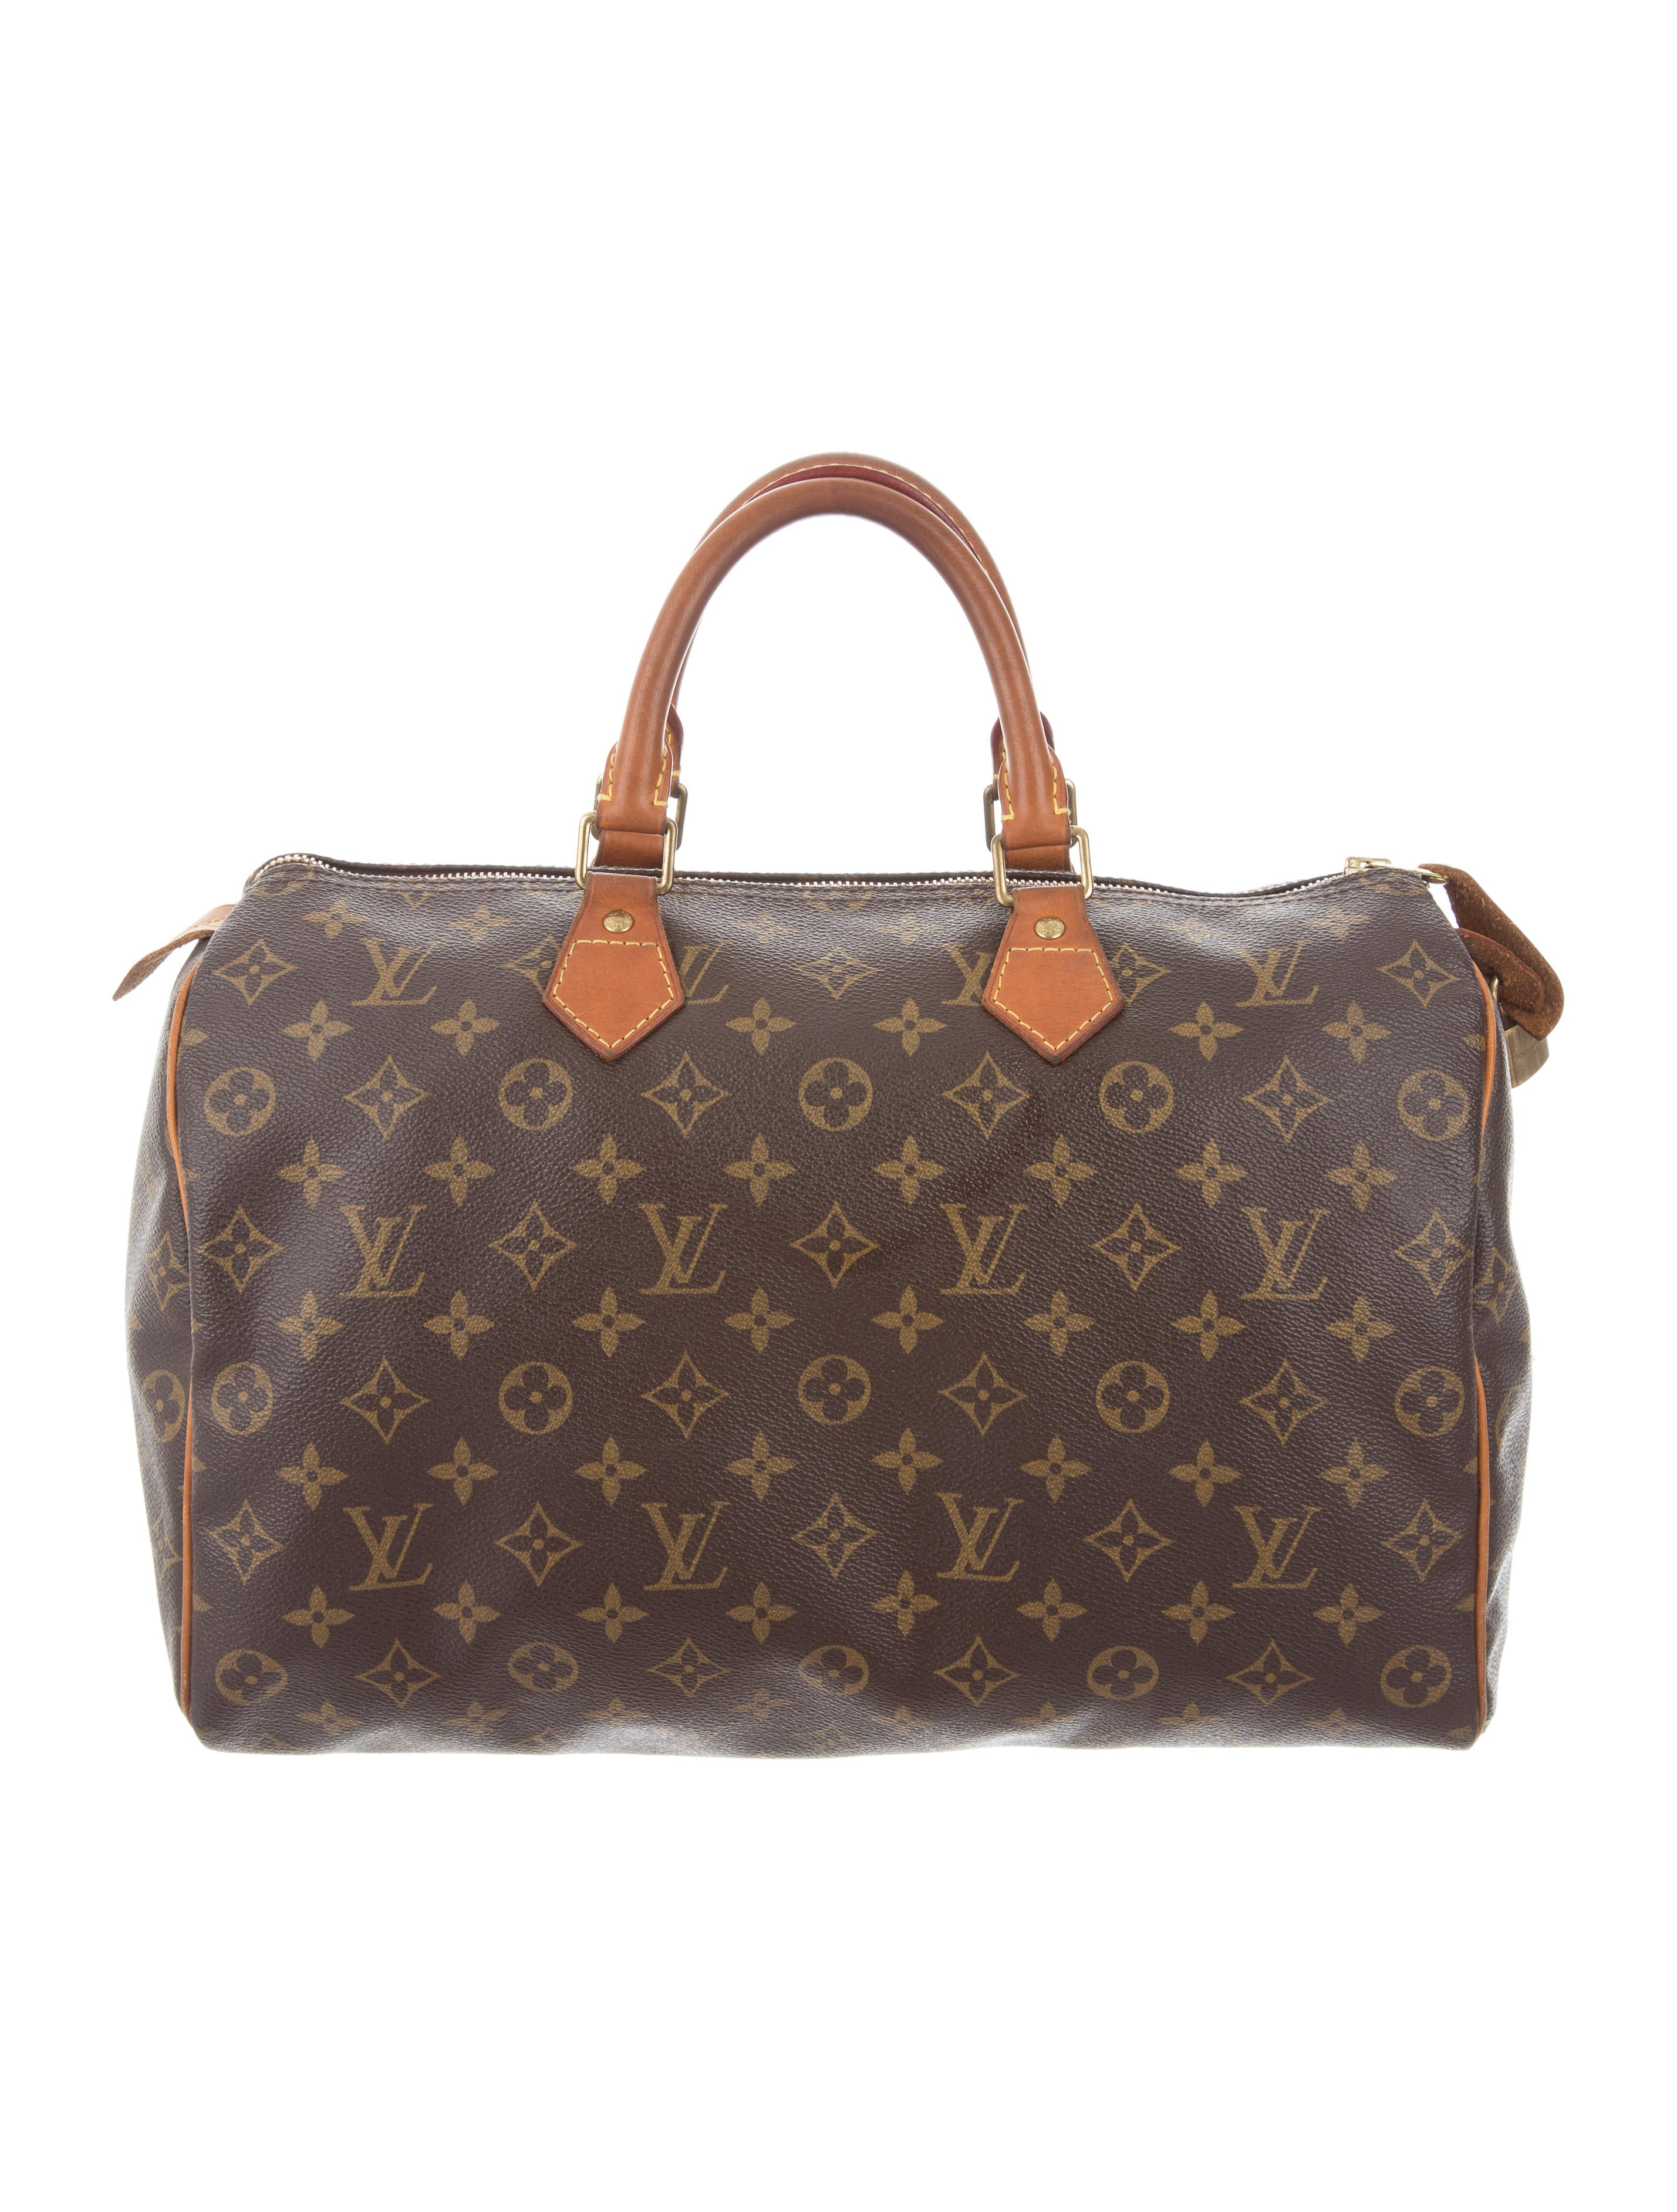 louis vuitton monogram speedy 35 handbags lou116619. Black Bedroom Furniture Sets. Home Design Ideas